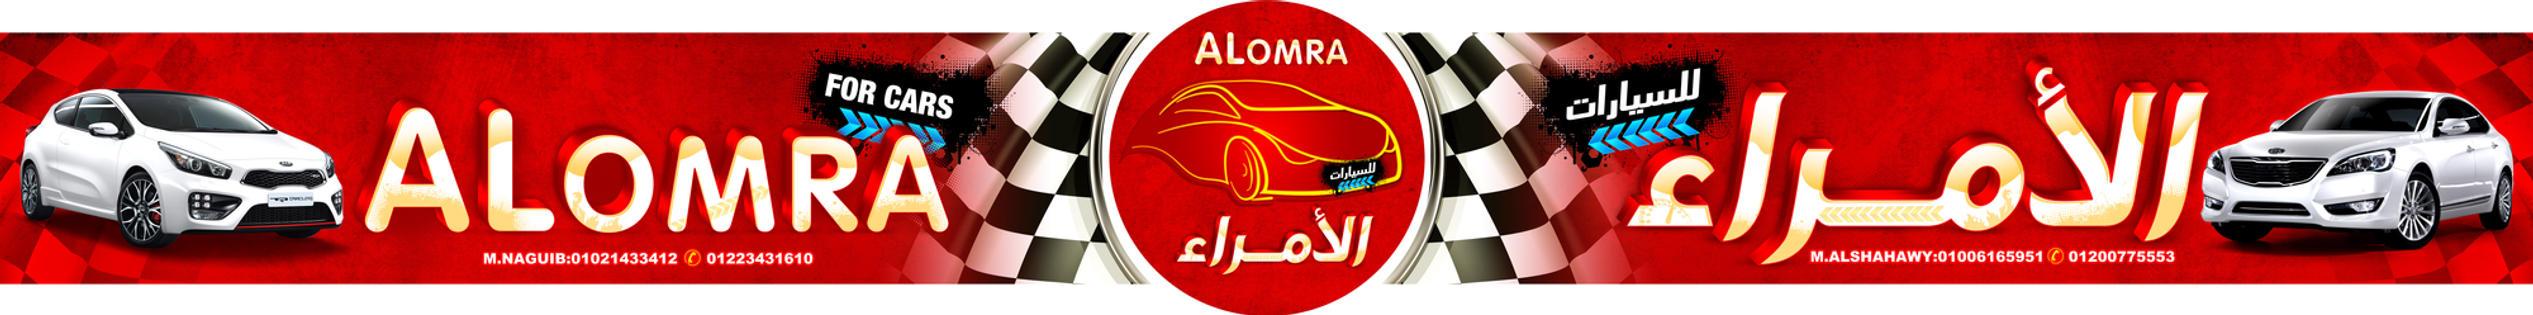 alomra by ELKASHORY